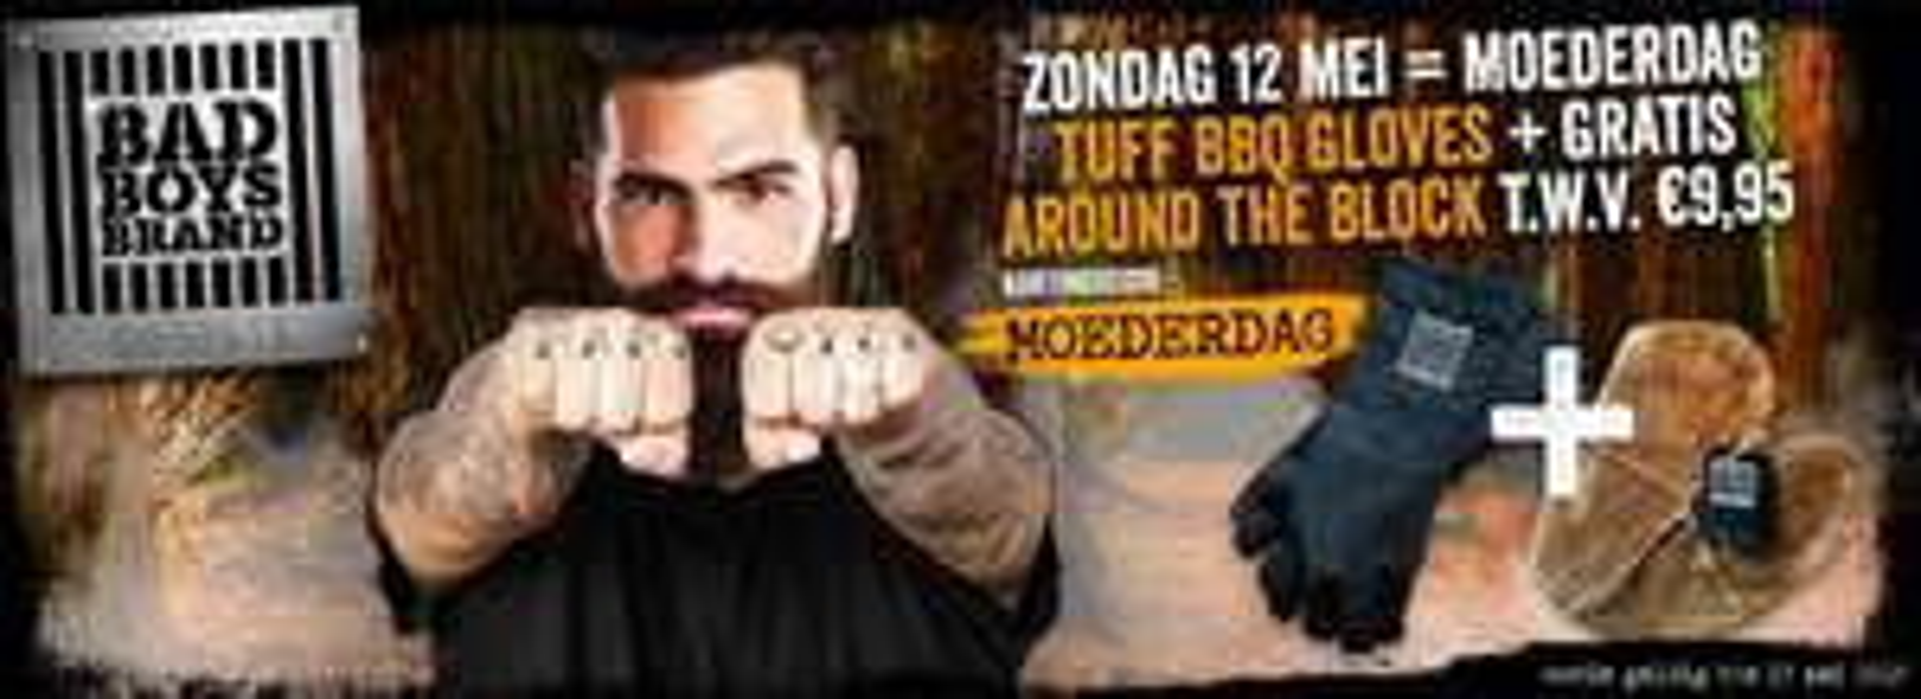 TURF BBQ Gloves + gratis Around the Block snijplank